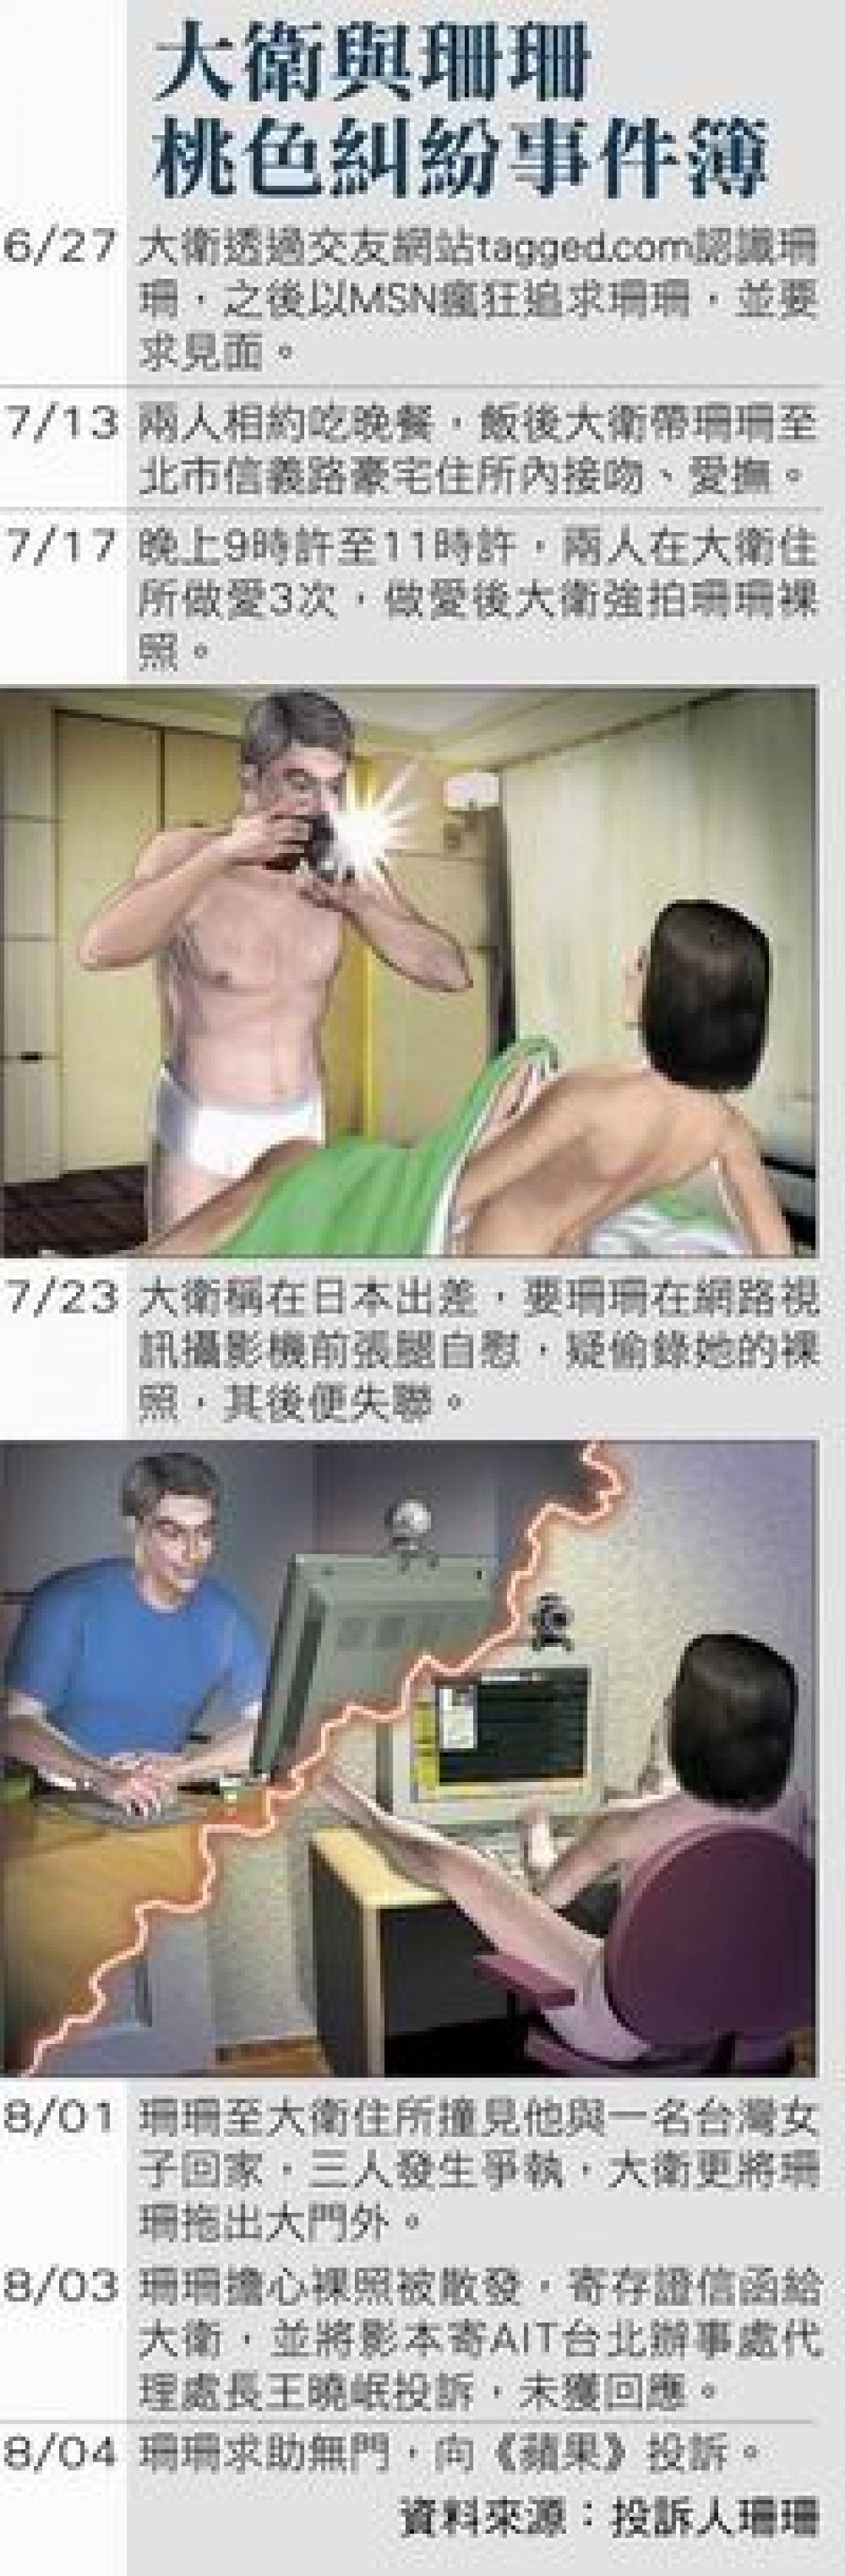 Apple Daily Illustration